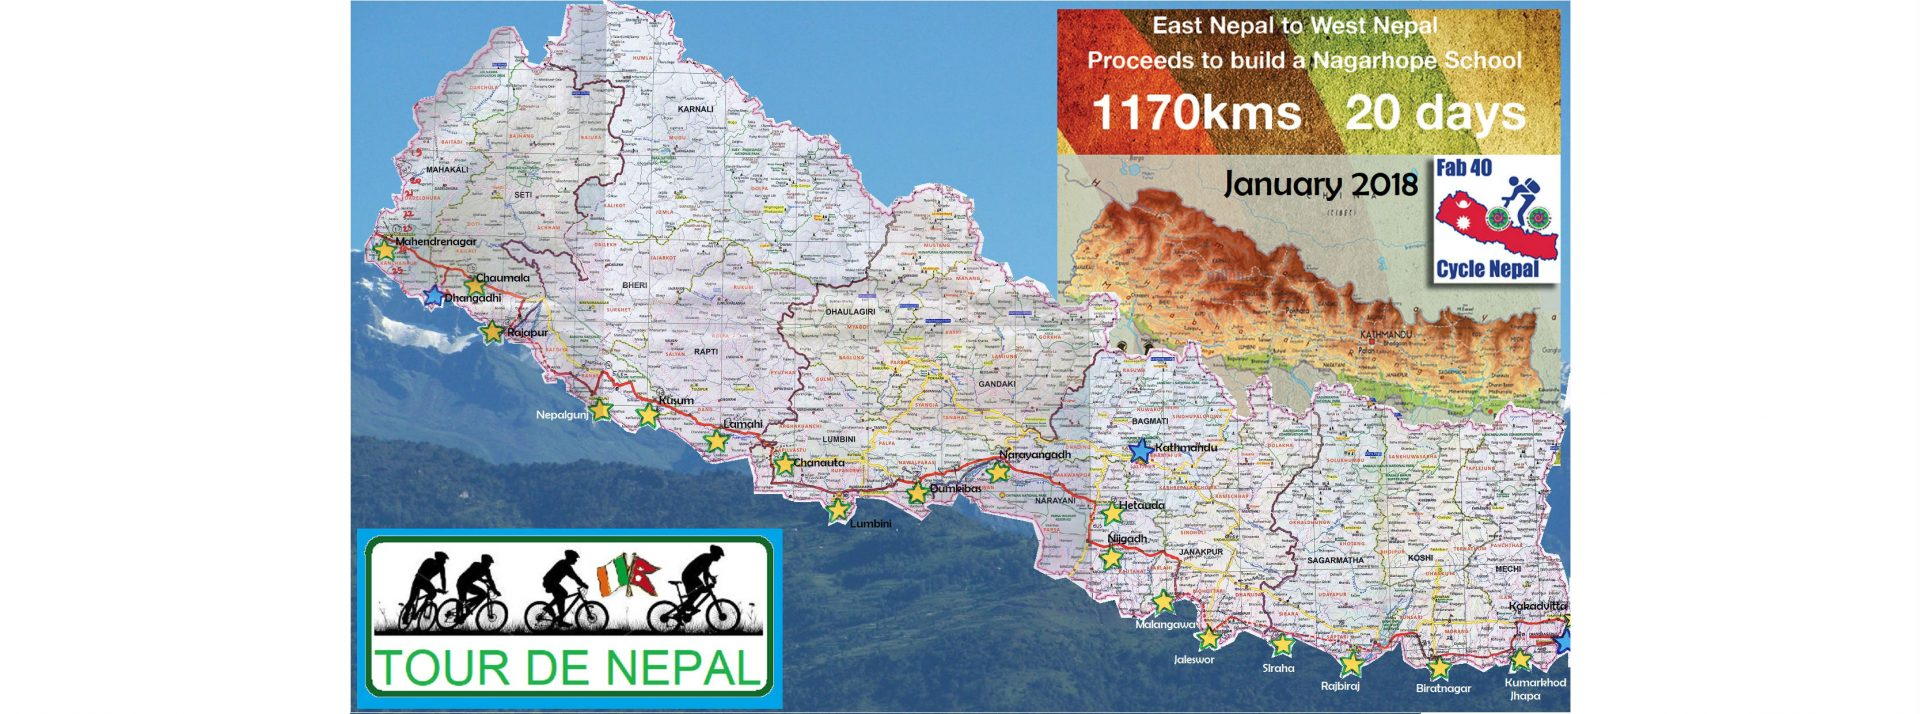 Fab 40 Cycle Nepal